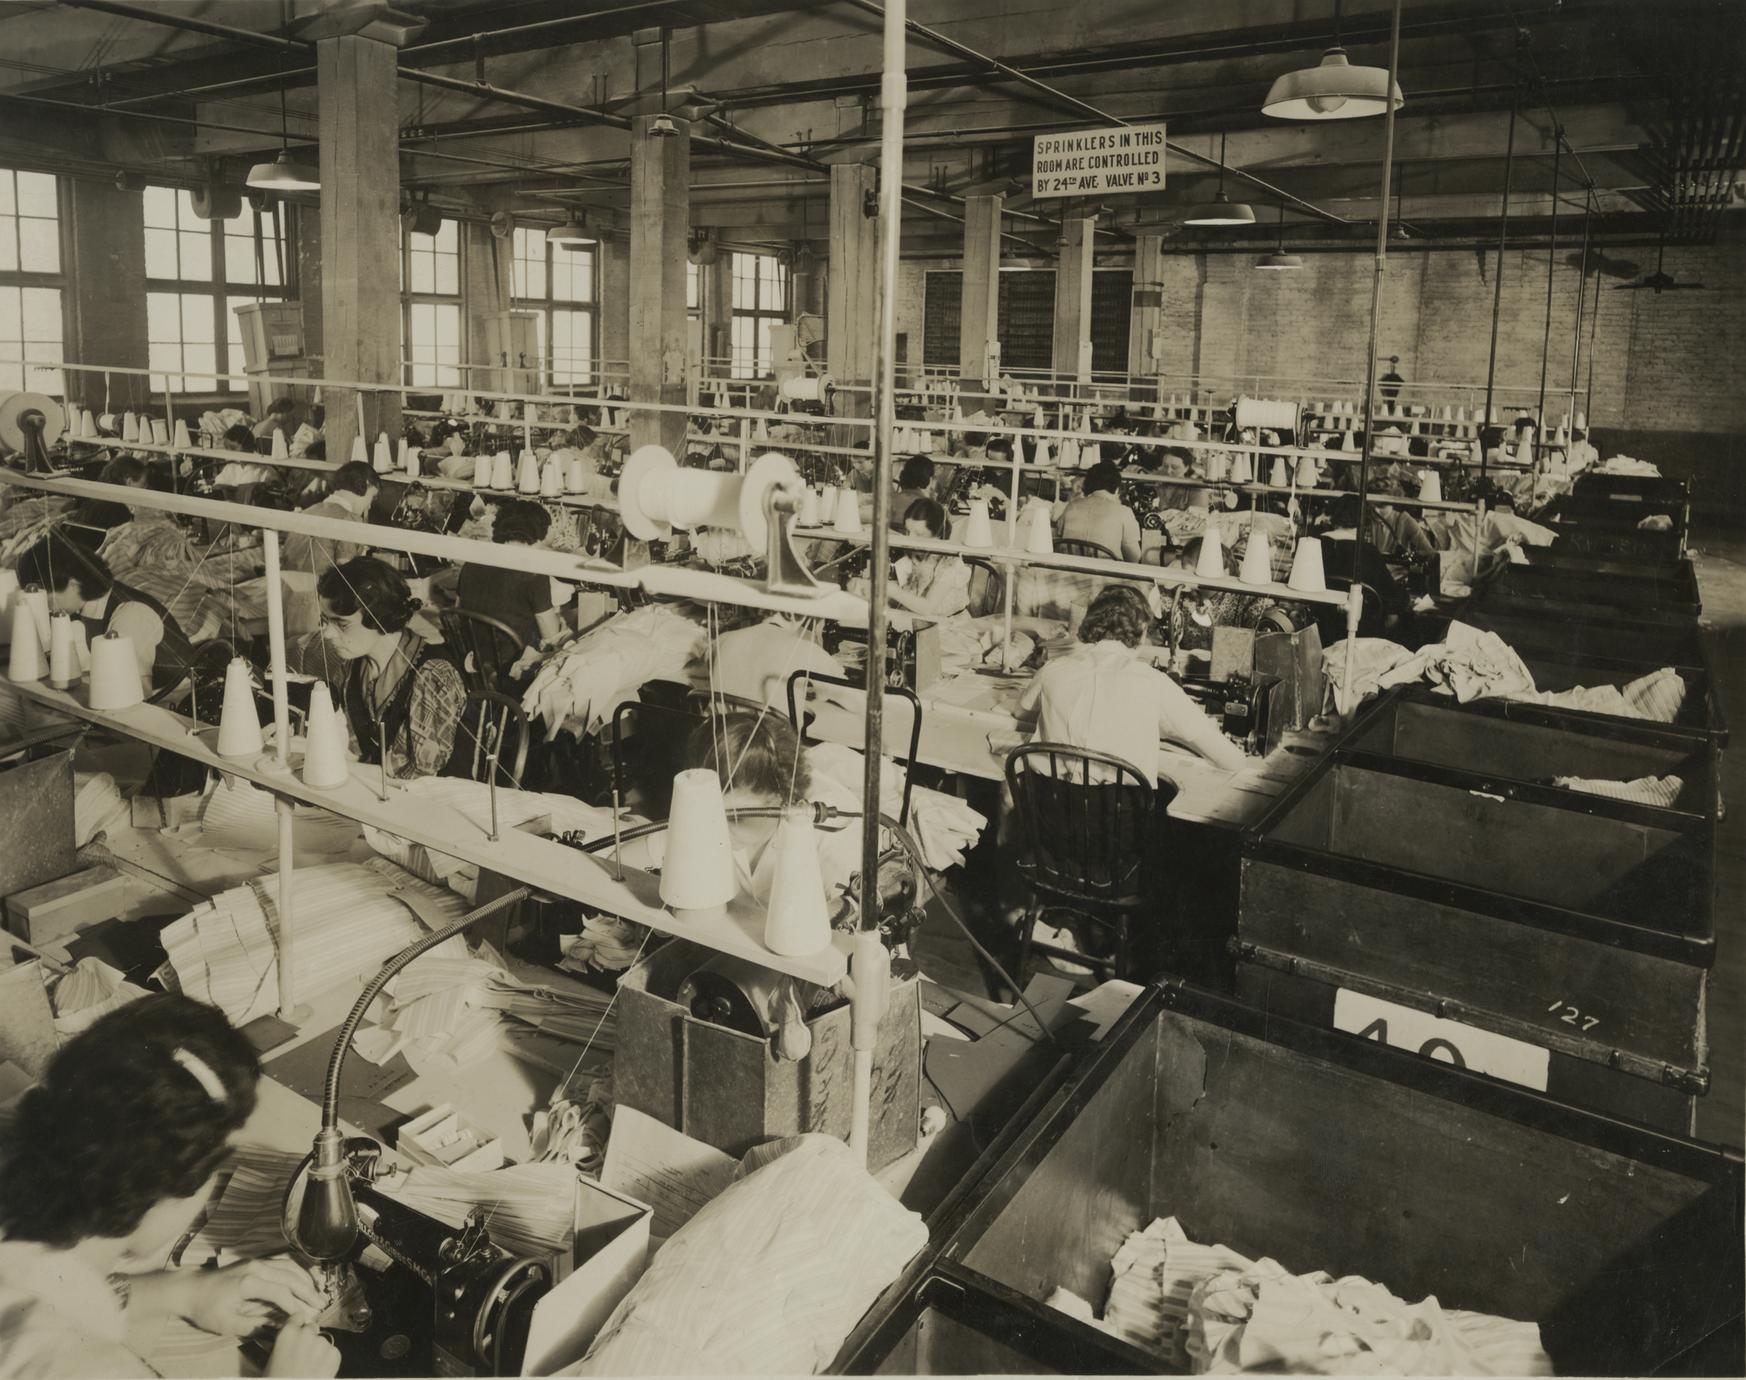 Cooper Underwear factory employees at work